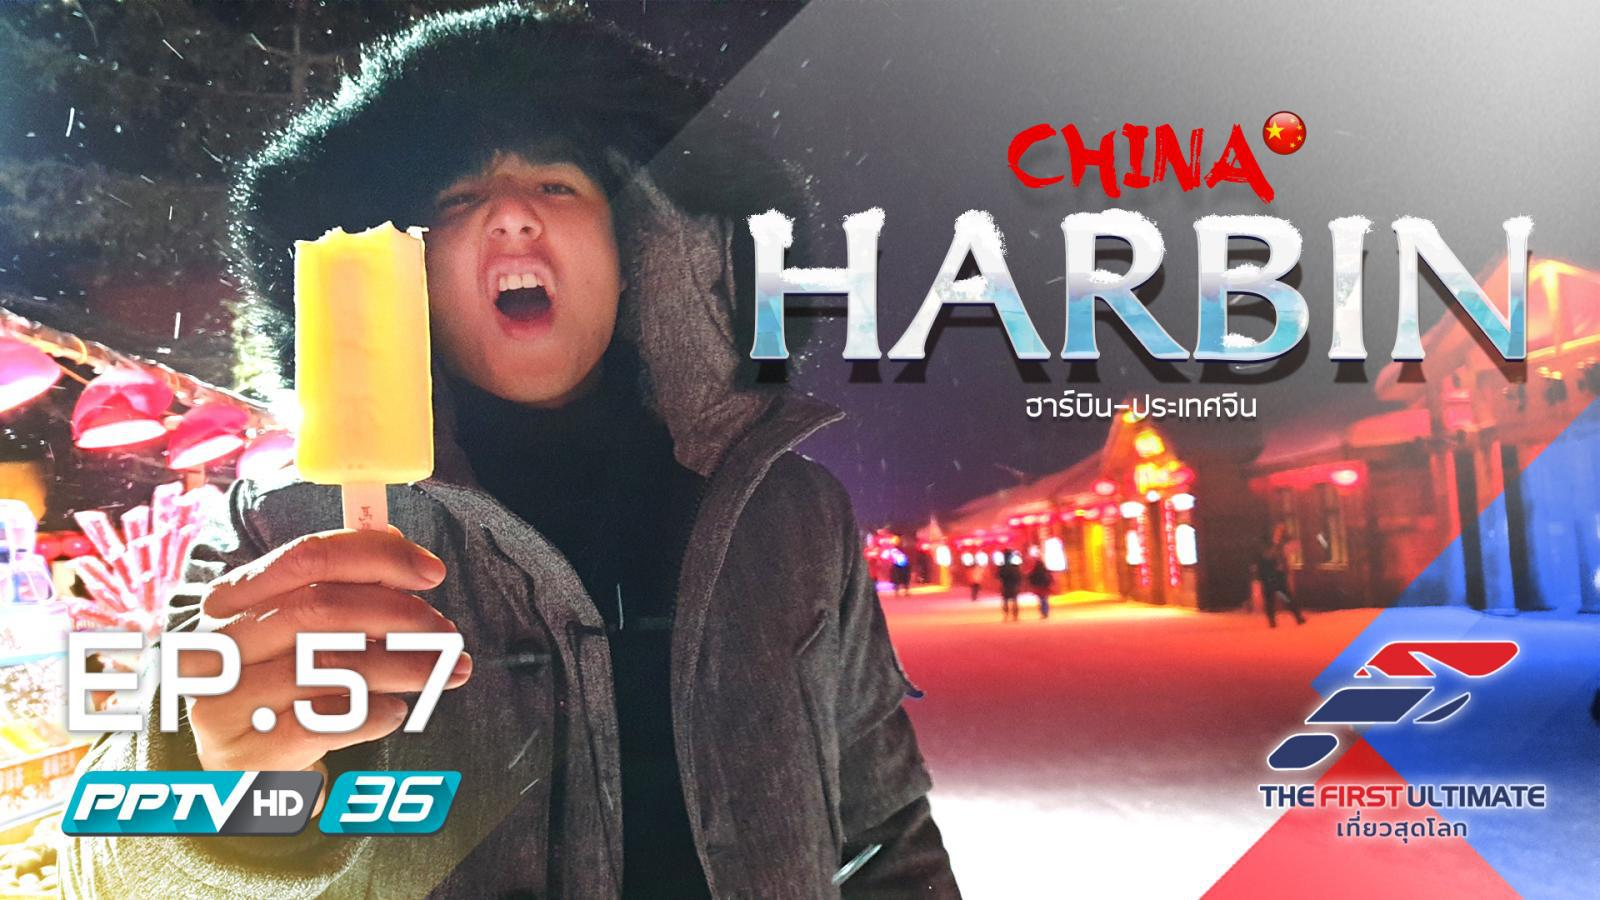 Harbin ตอน 2